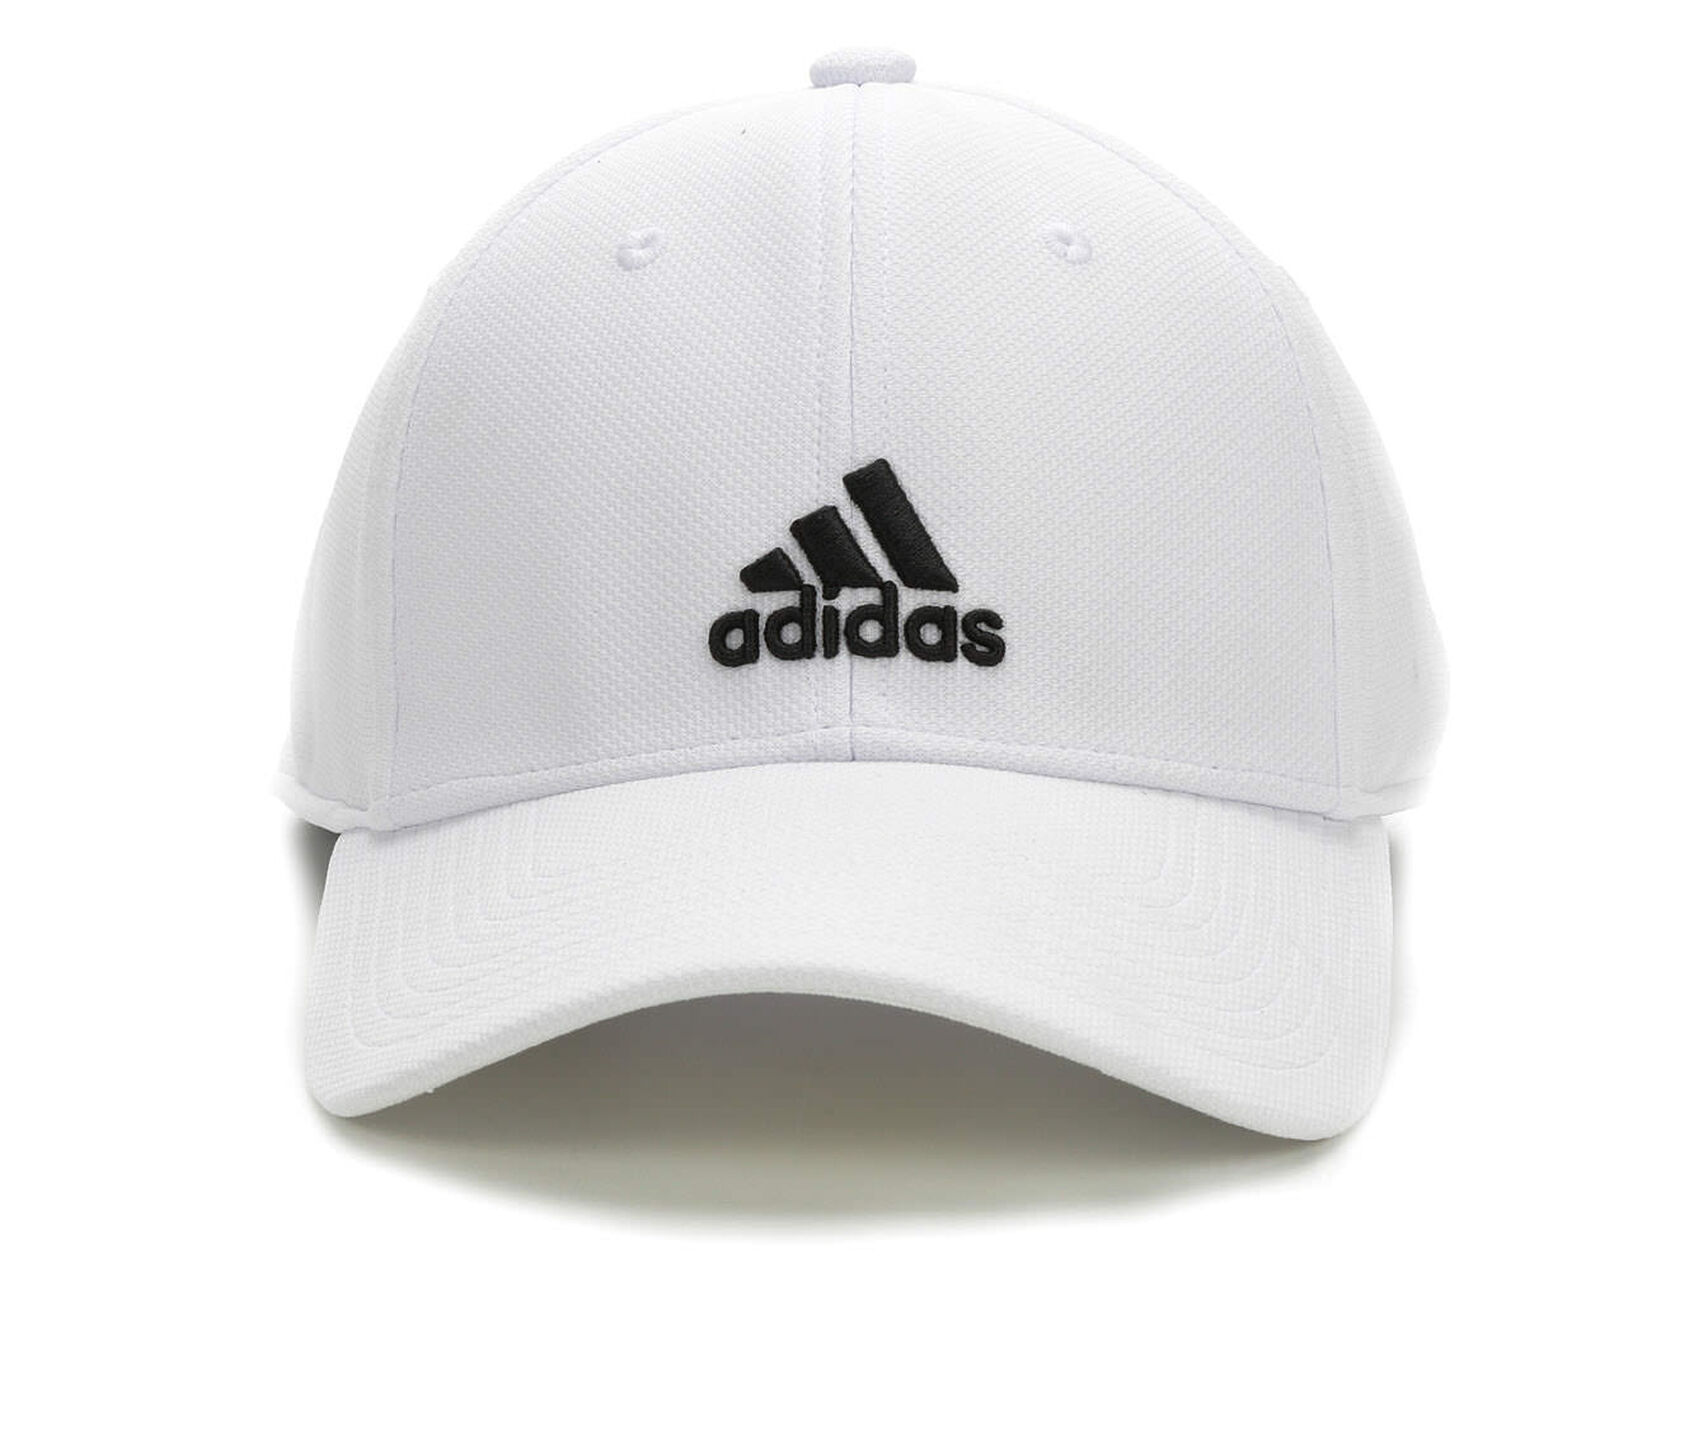 7f21d1fa1eedb Adidas Men's Rucker Stretch Fit Baseball Cap